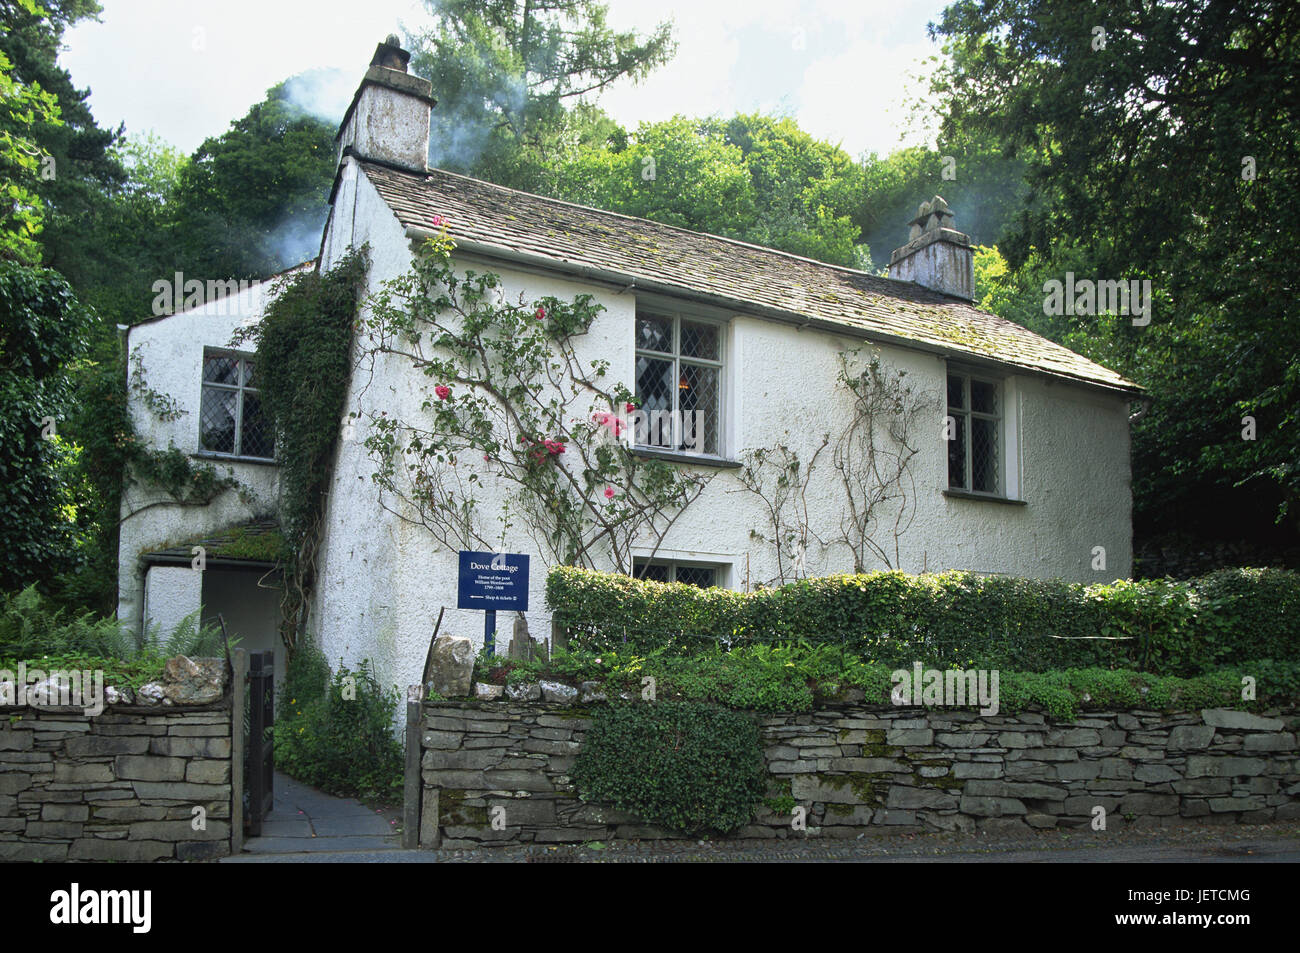 Great Britain, England, Cumbria, brine District, Grasmere, Dove Cottage, Wordsworth's House, Europe, destination, - Stock Image